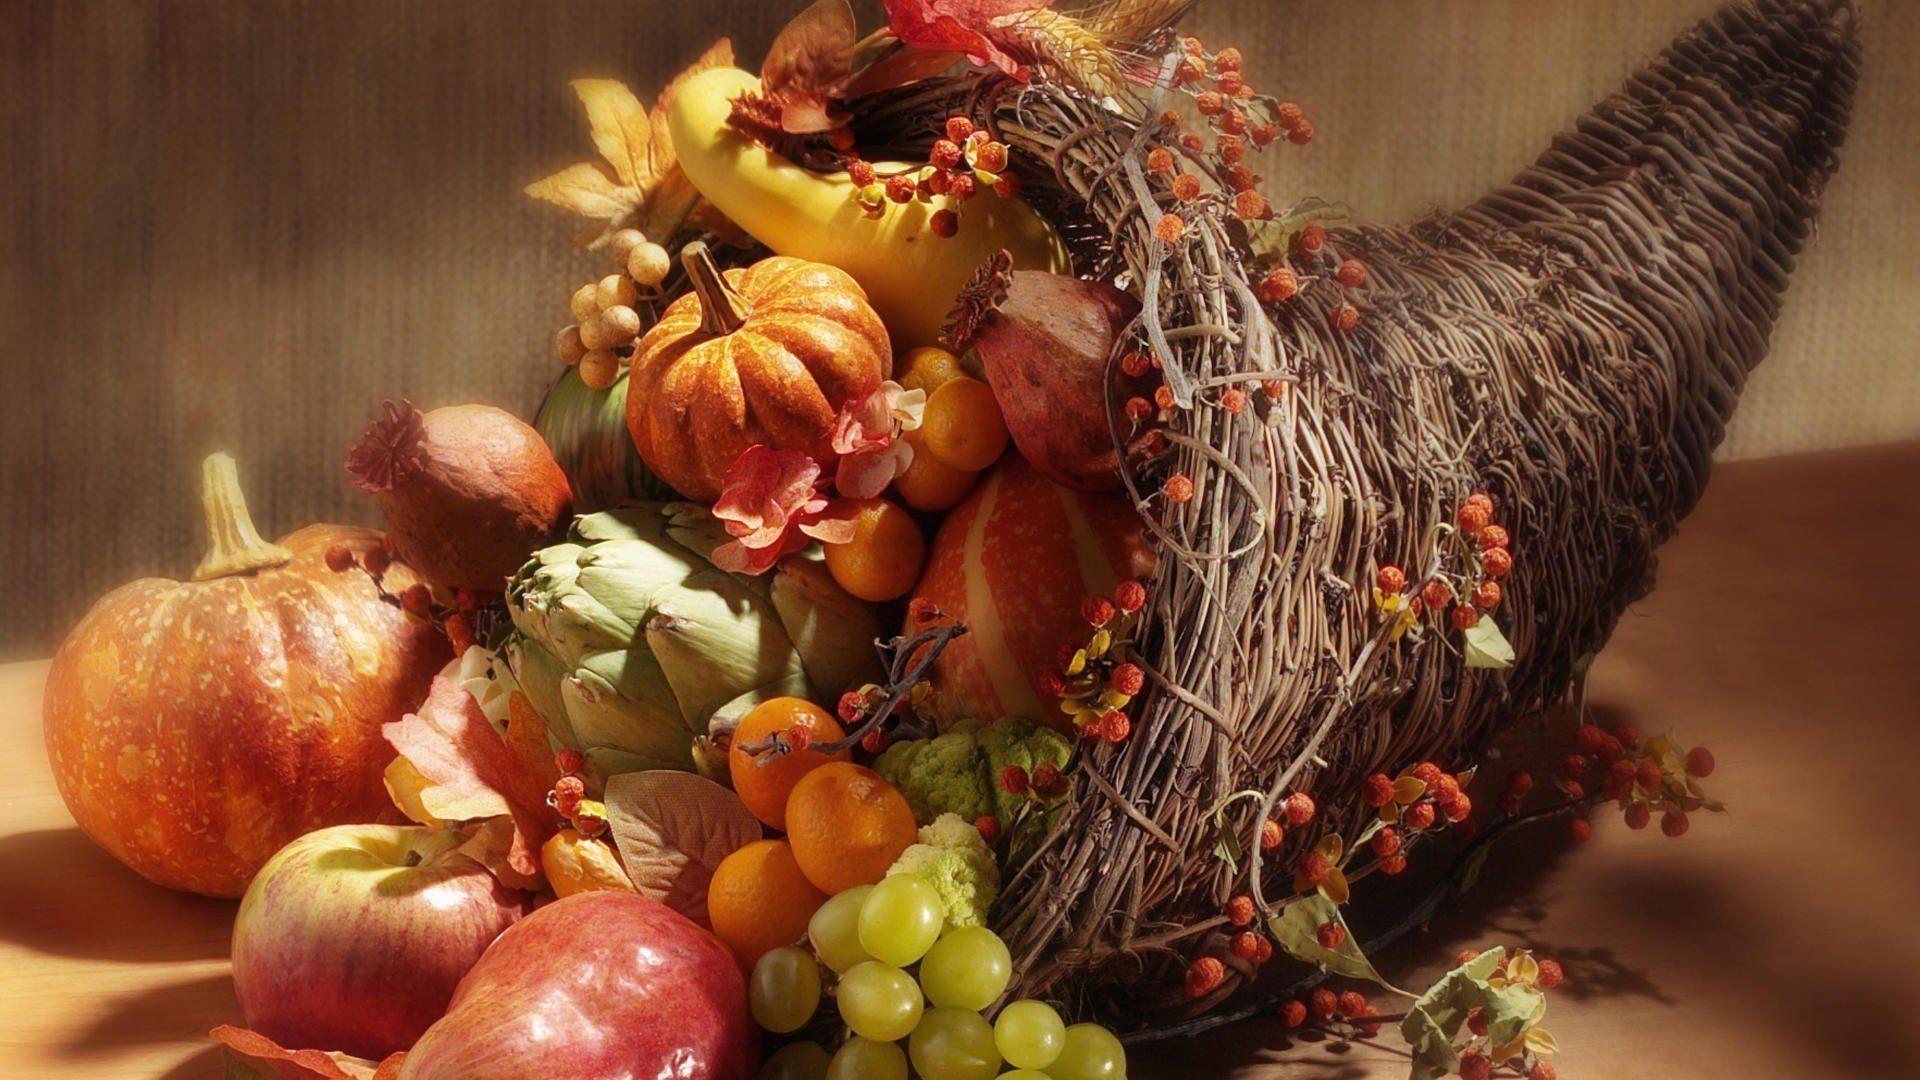 Thanksgiving Cornucopia Wallpapers - Top Free Thanksgiving ...